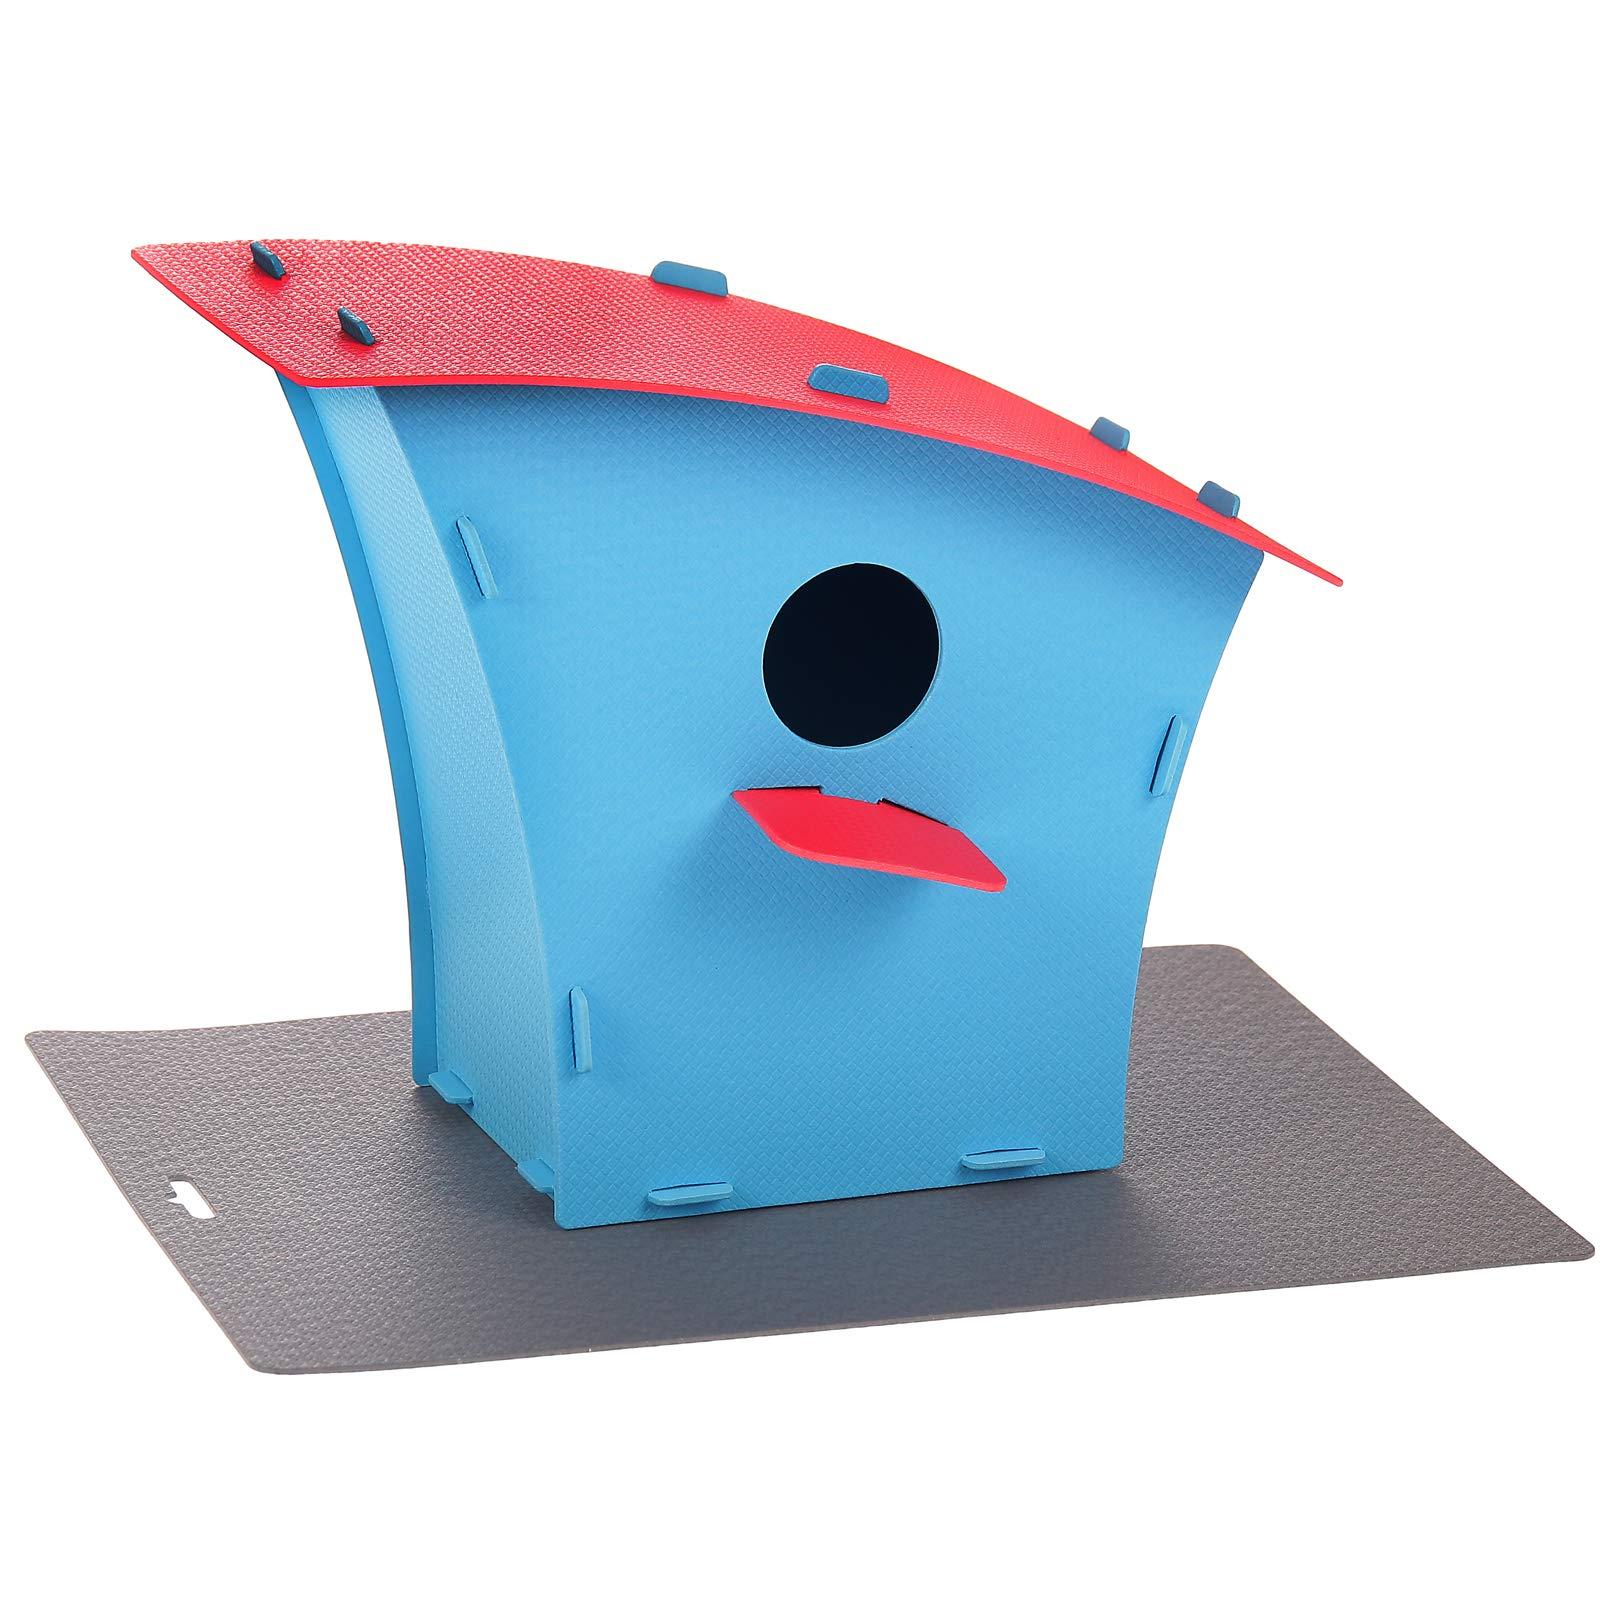 Blue Red Plastic Bird House | Nesting Box & Garden Home Decoration | Outdoors Feeder Birds